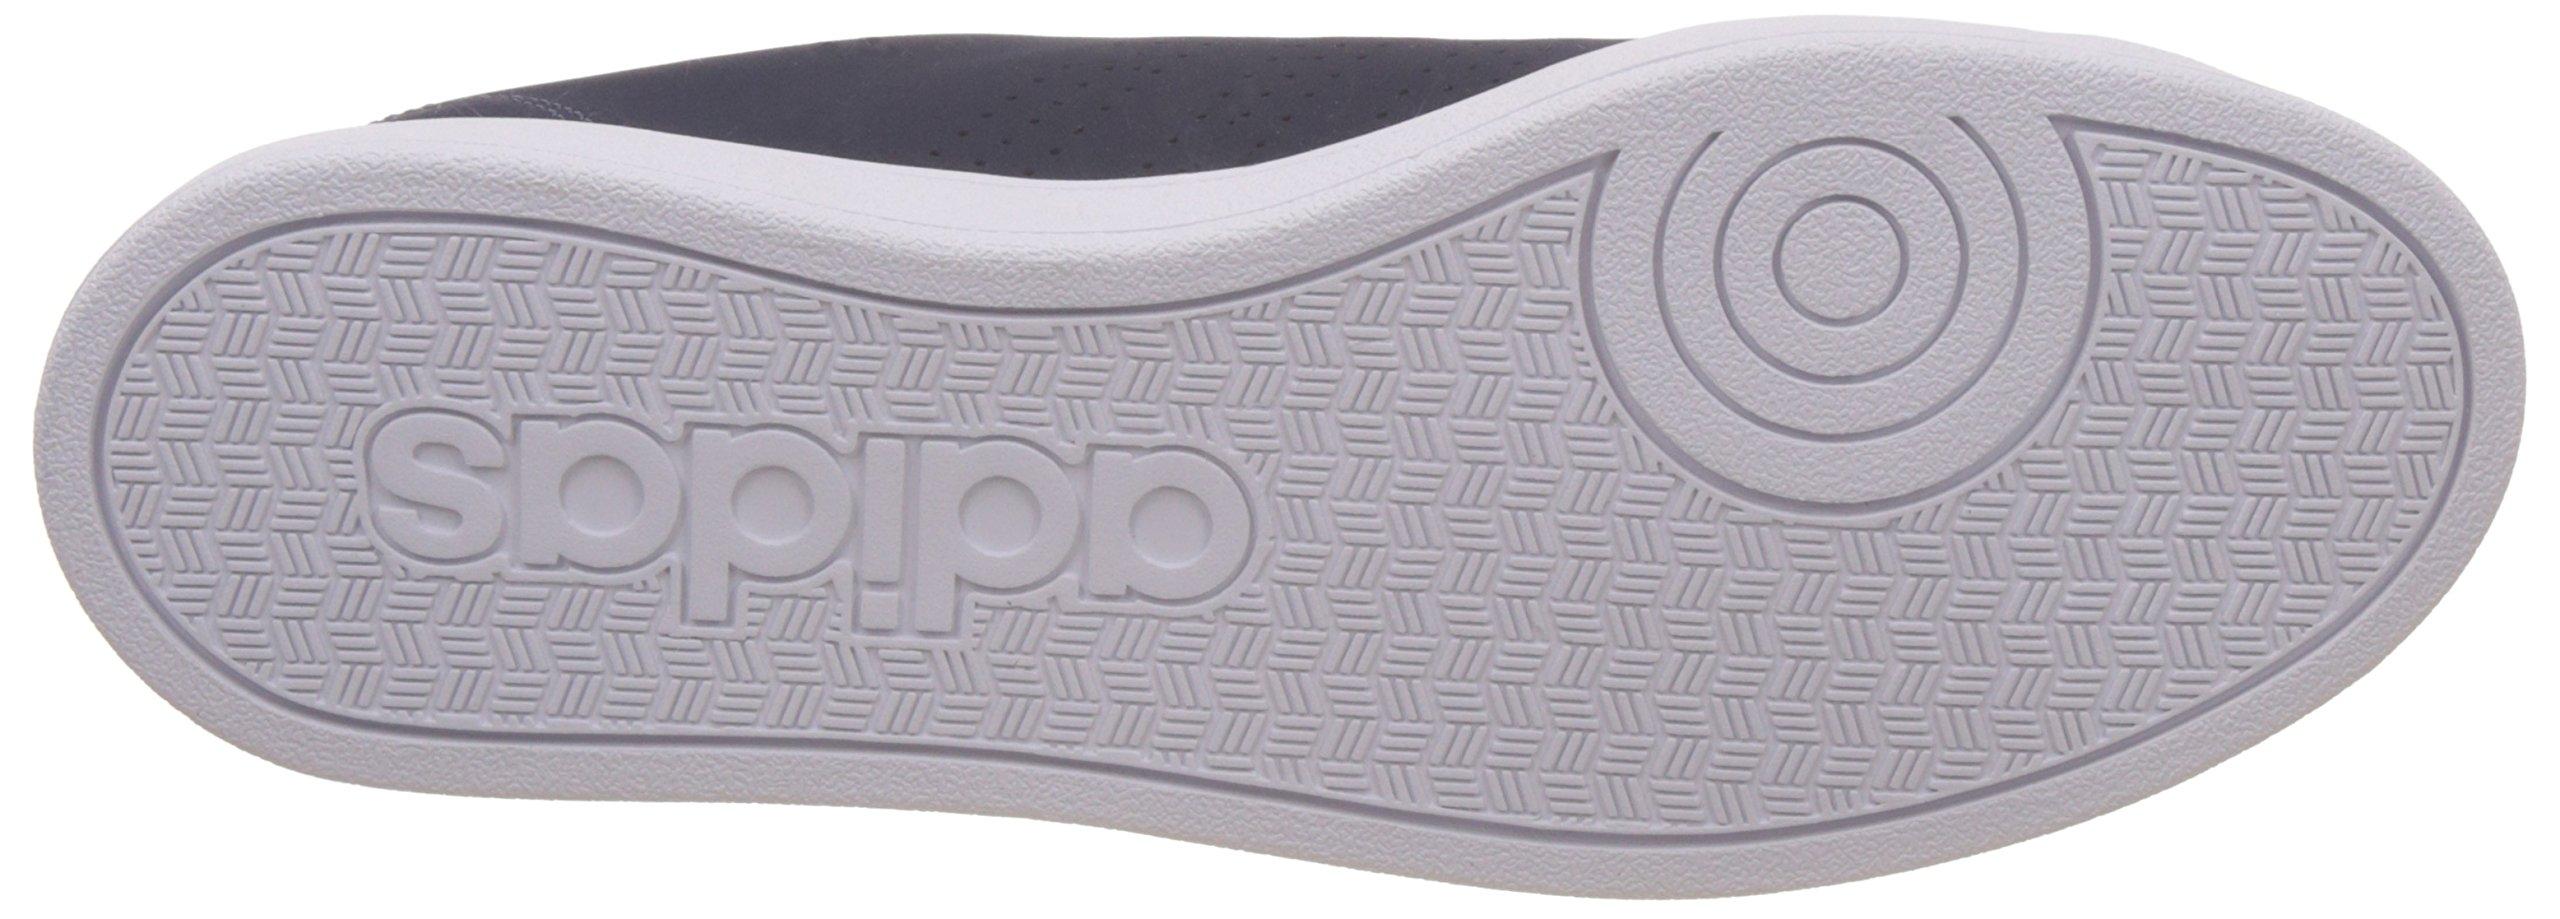 Adidas NEO Advantage Clean VS, Scarpe da Ginnastica Uomo 3 spesavip